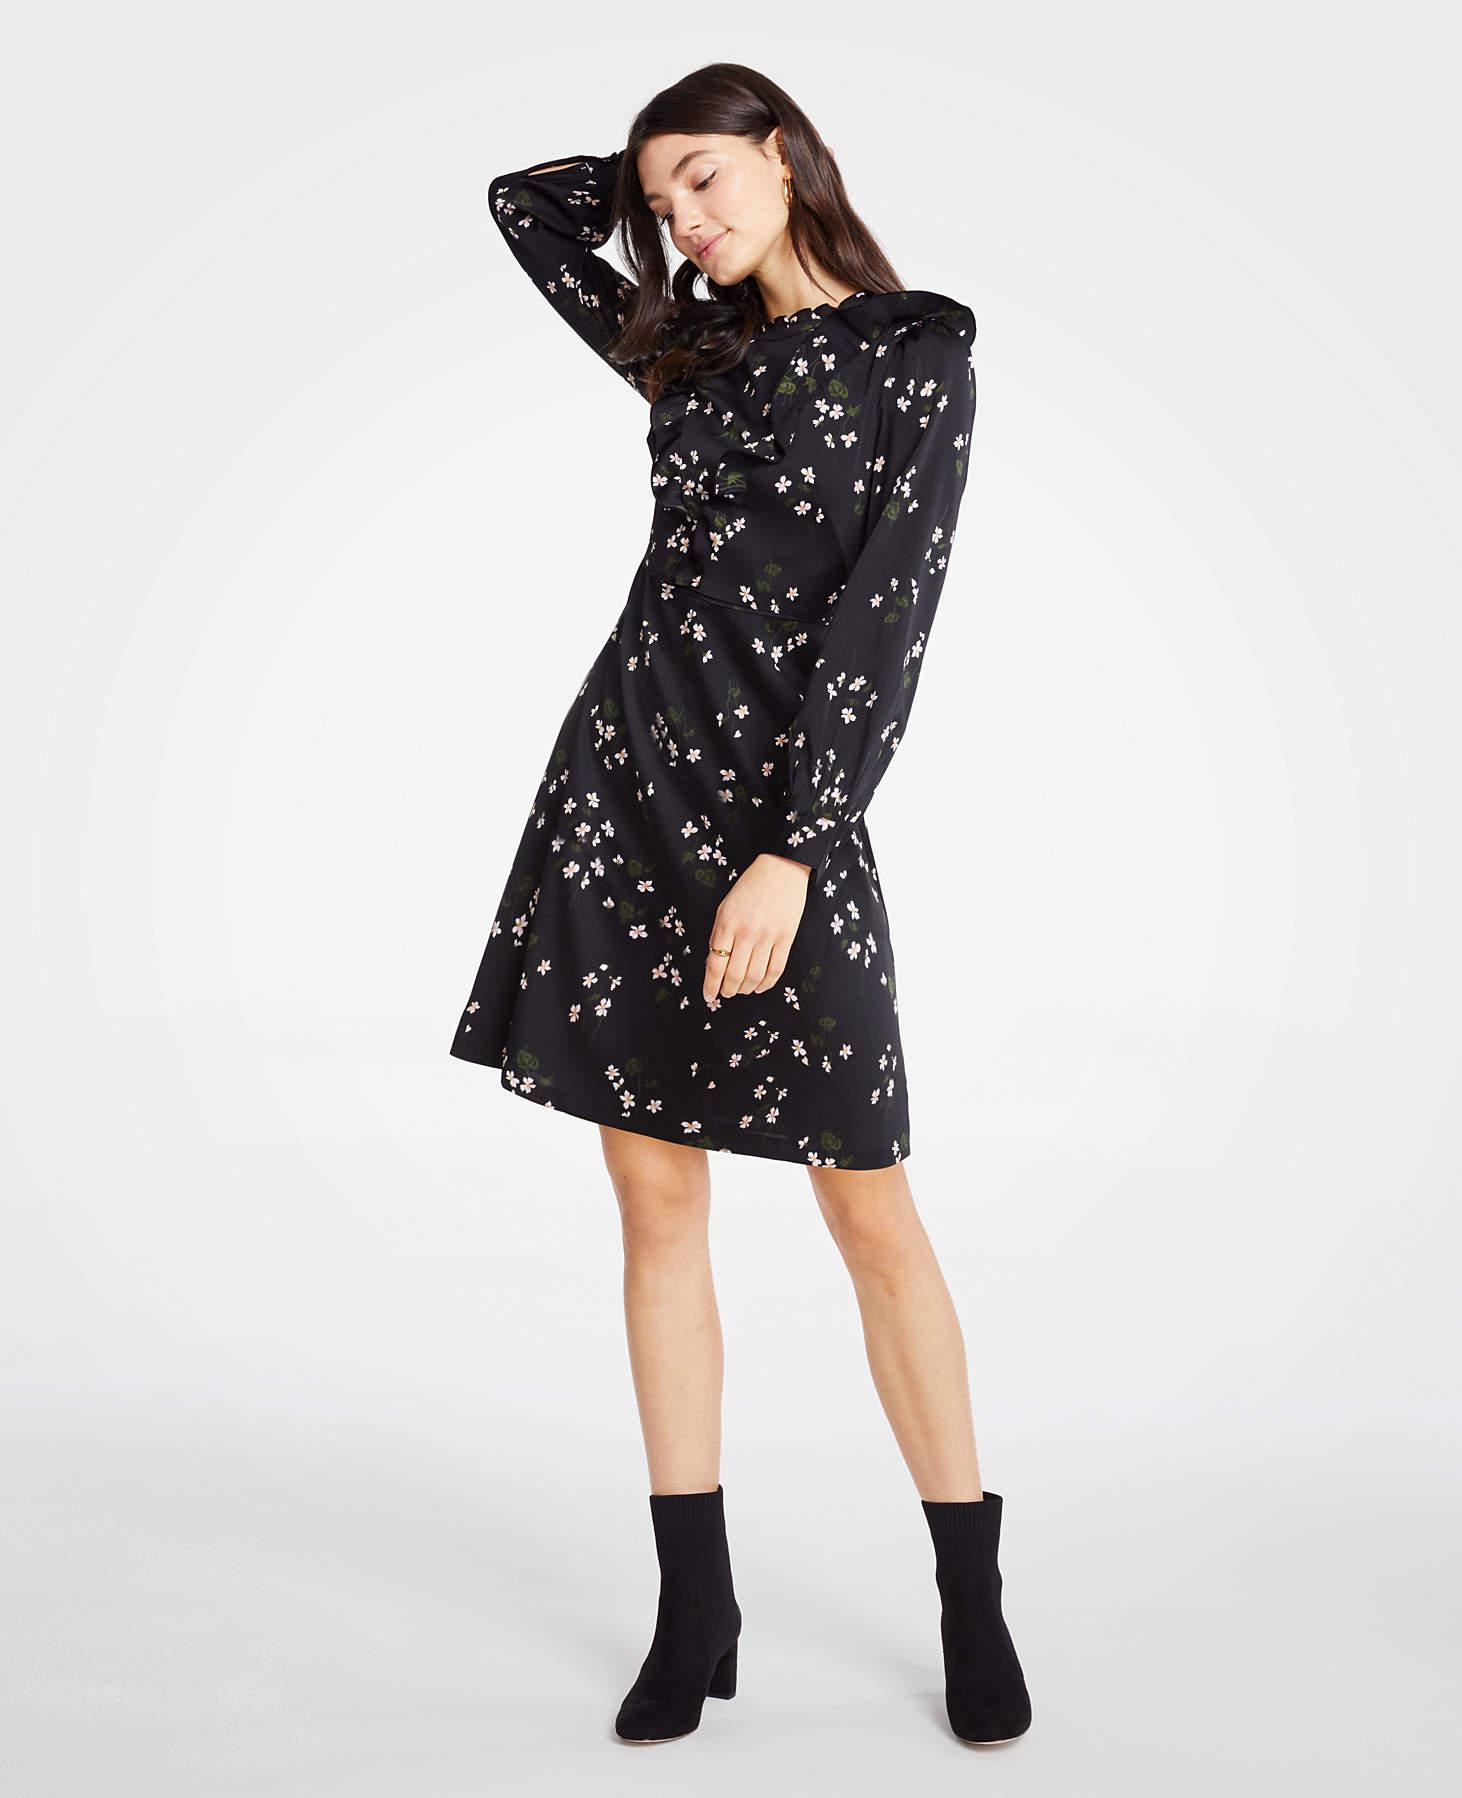 8202244d95 Ann Taylor Floral Ruffle Flare Dress in Black - Lyst